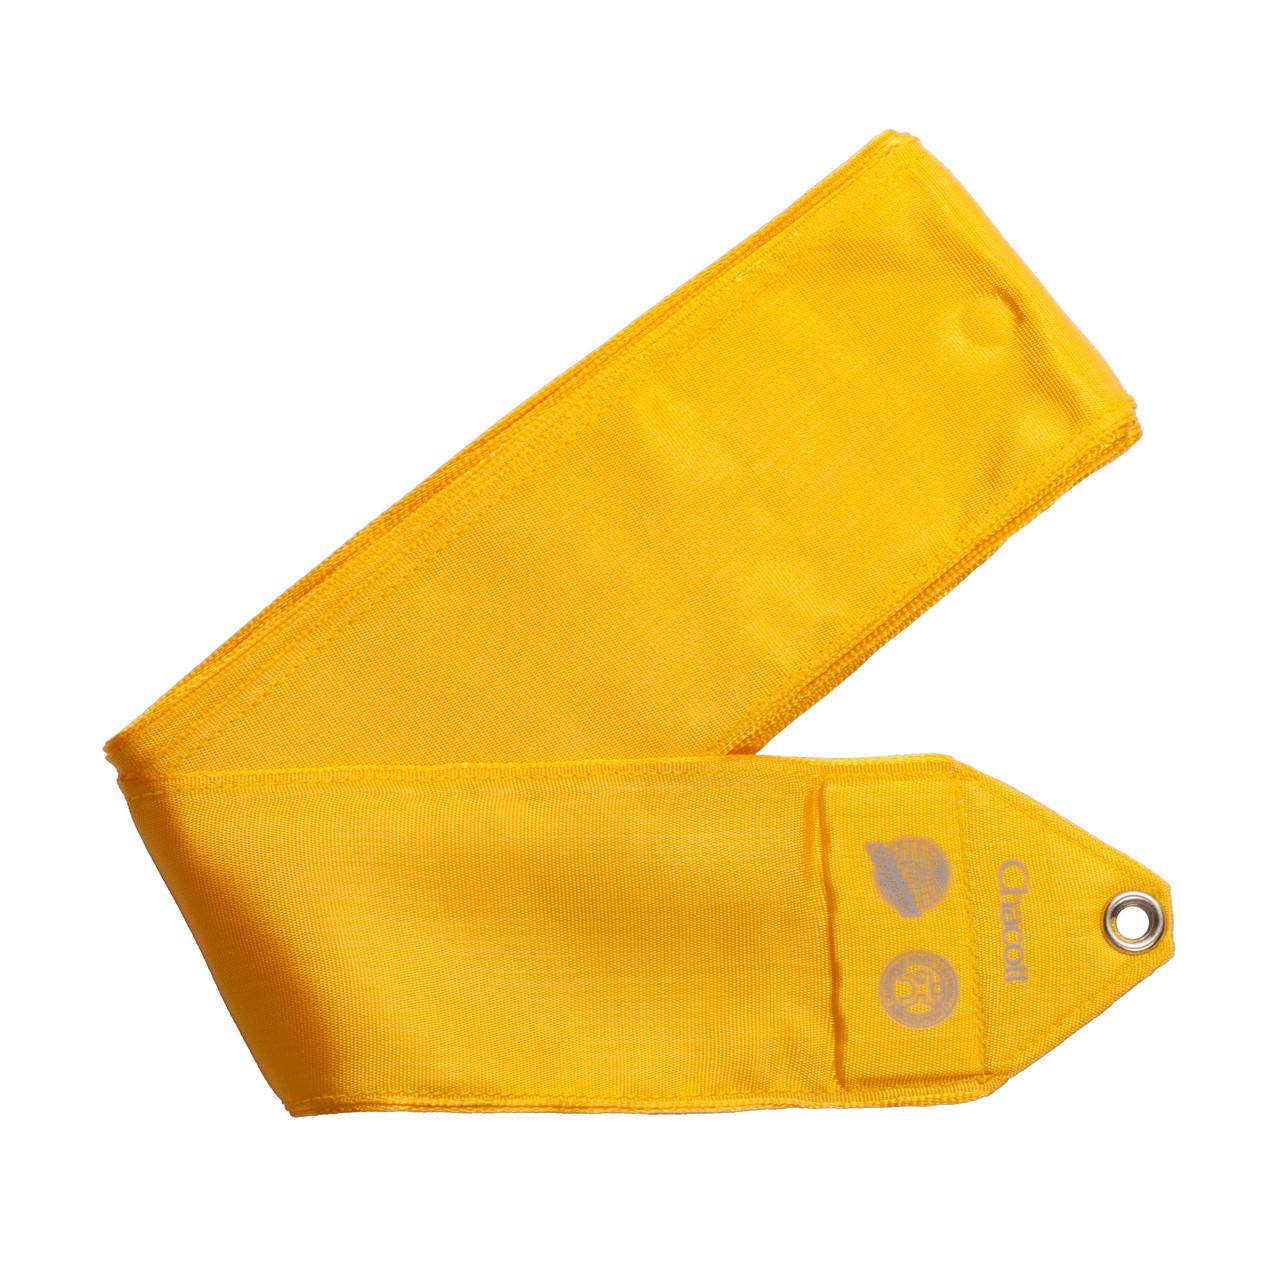 Стрічка Chacott 65404-Med Ribbon 5м синт.шовк Lemon Yellow 063